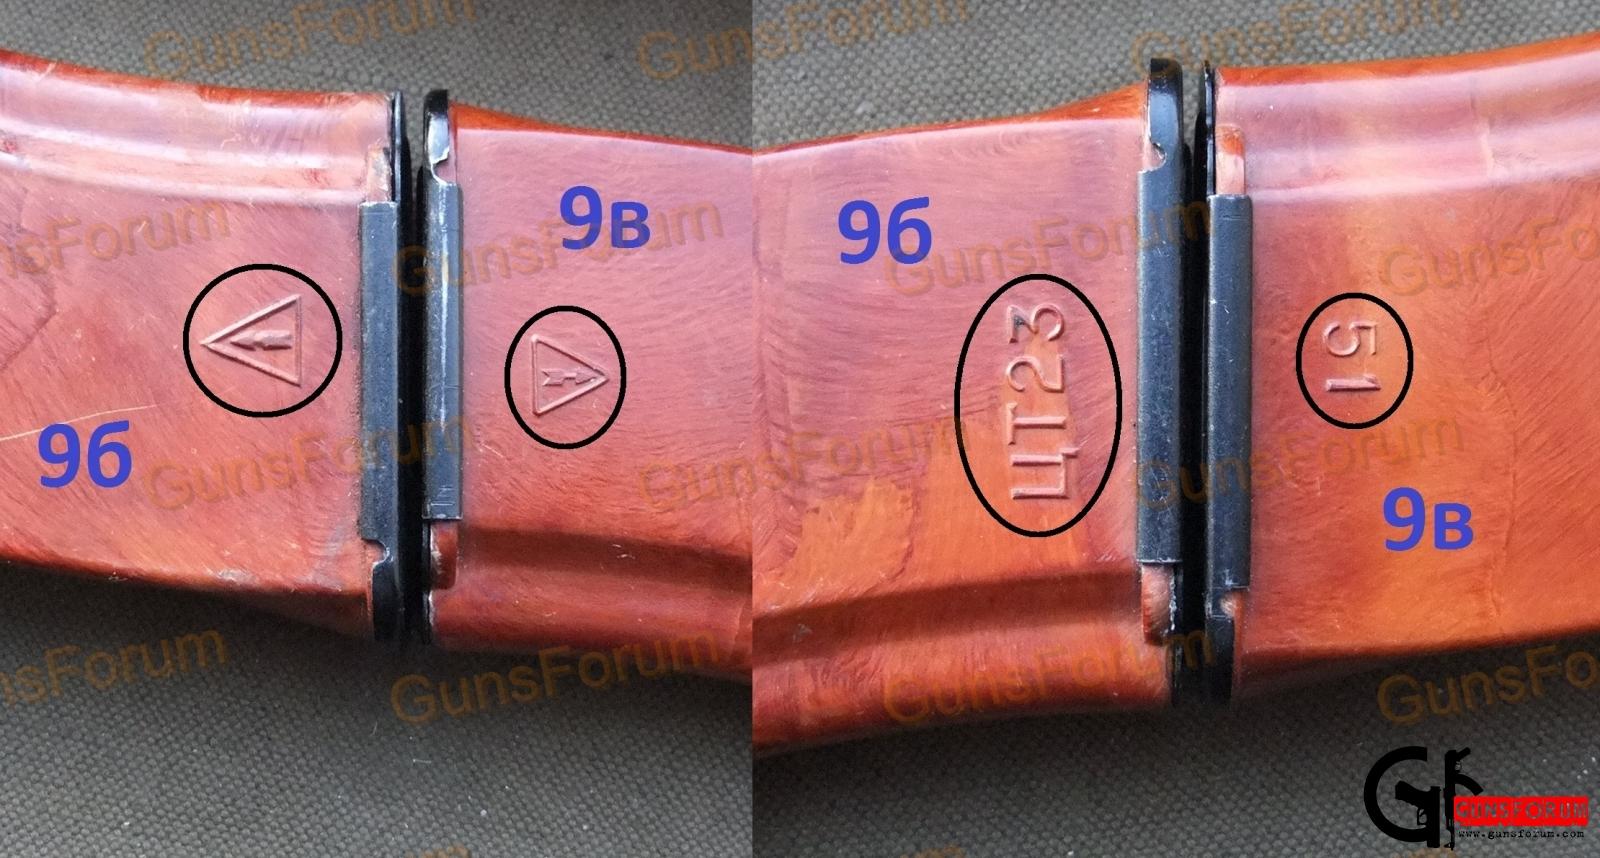 large_54.JPG.558ad30abf9ff1249fe7e3ebf4061010.JPG